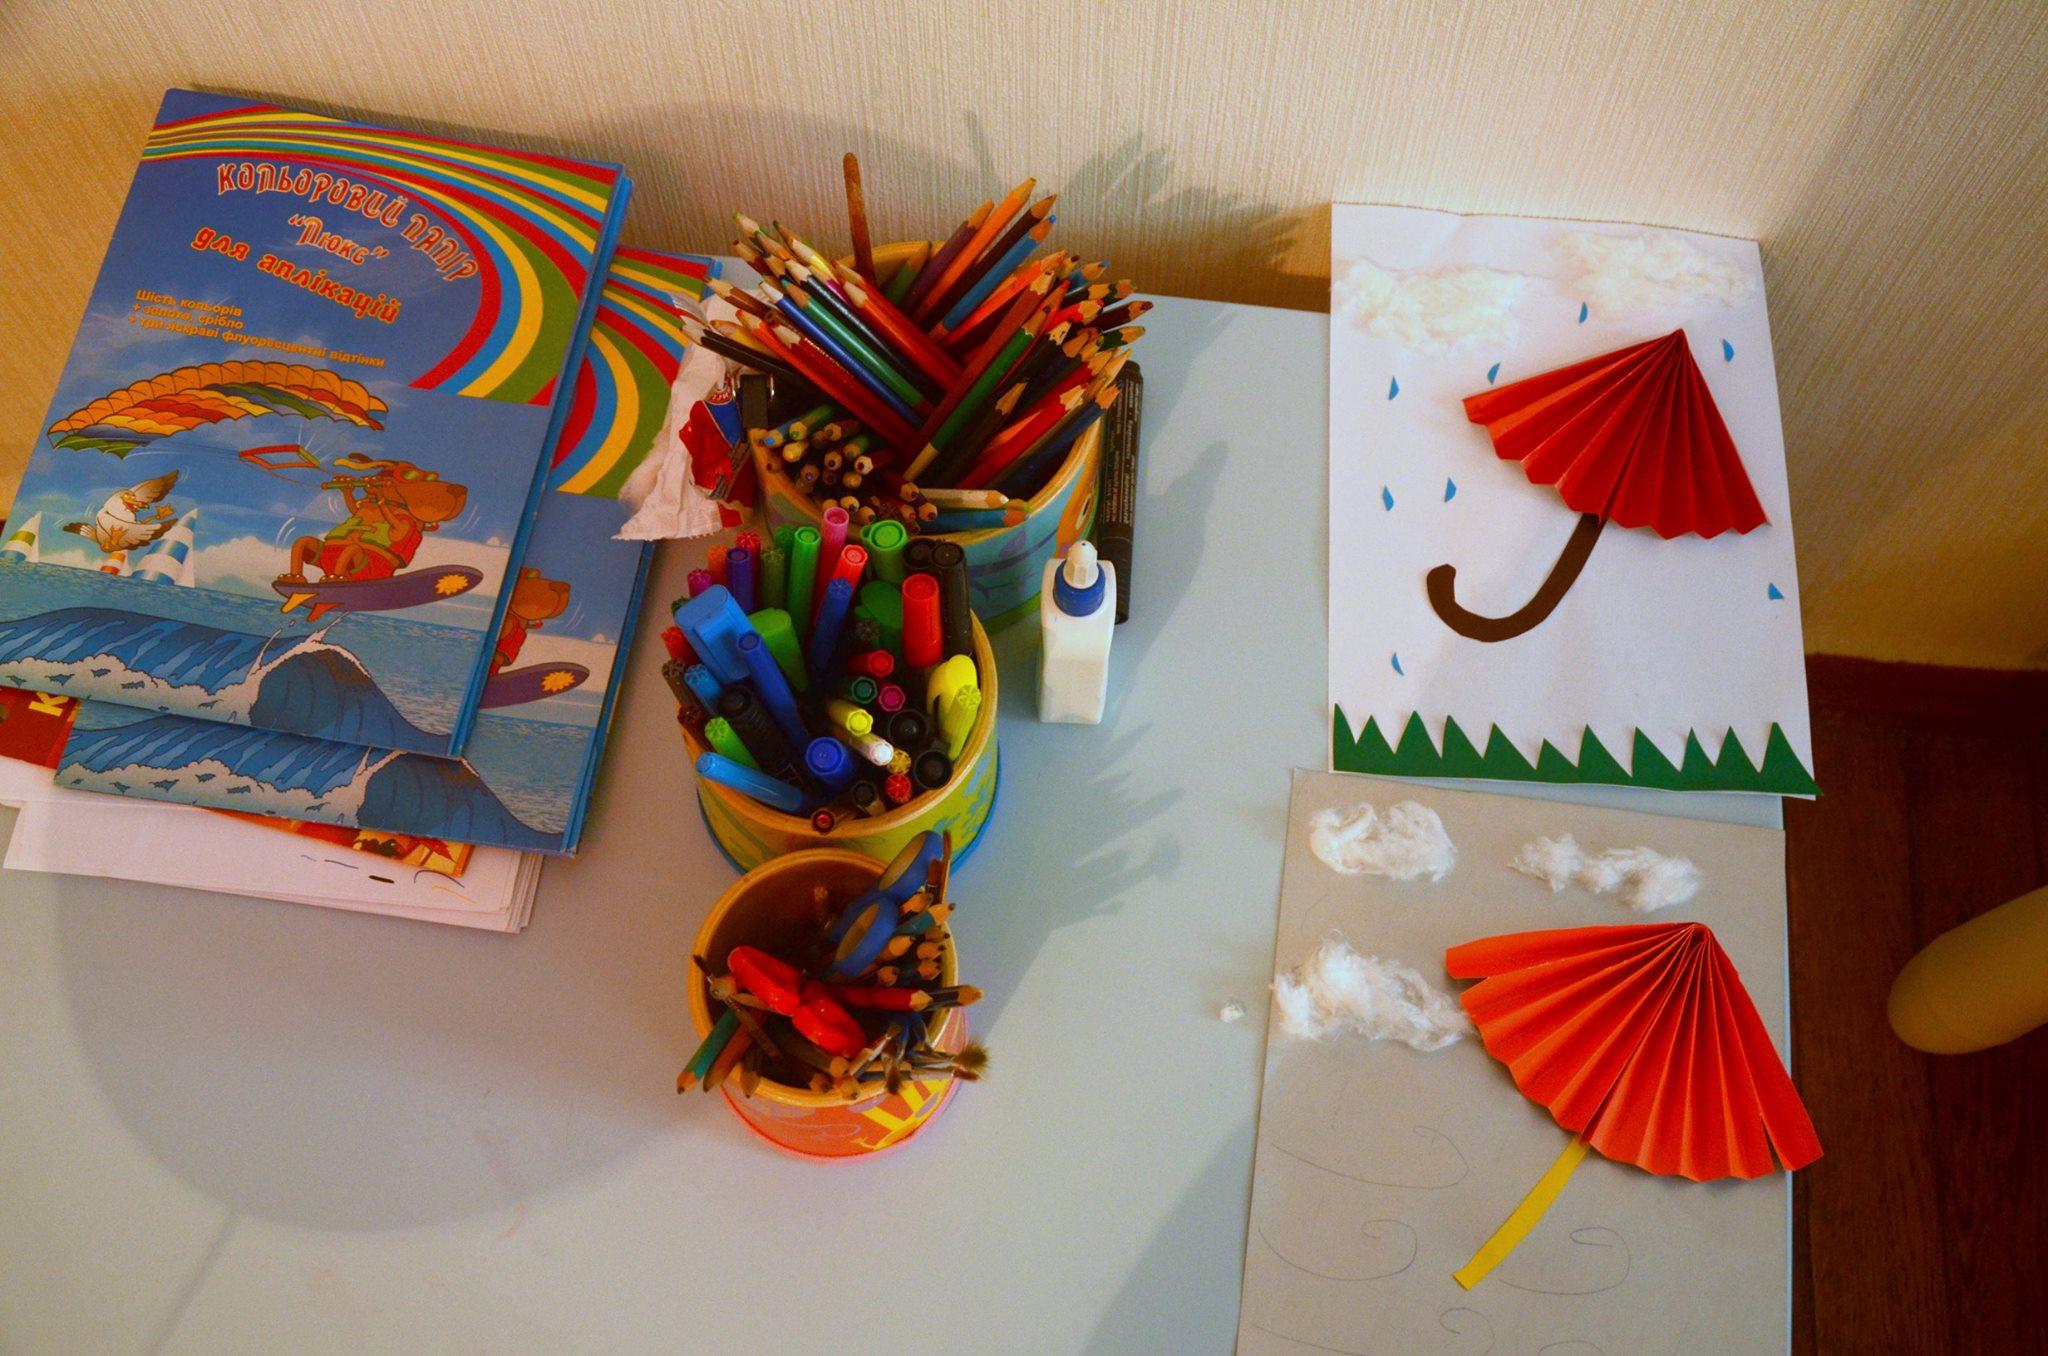 Фото: Дитячий простір Para Solka/facebook.com